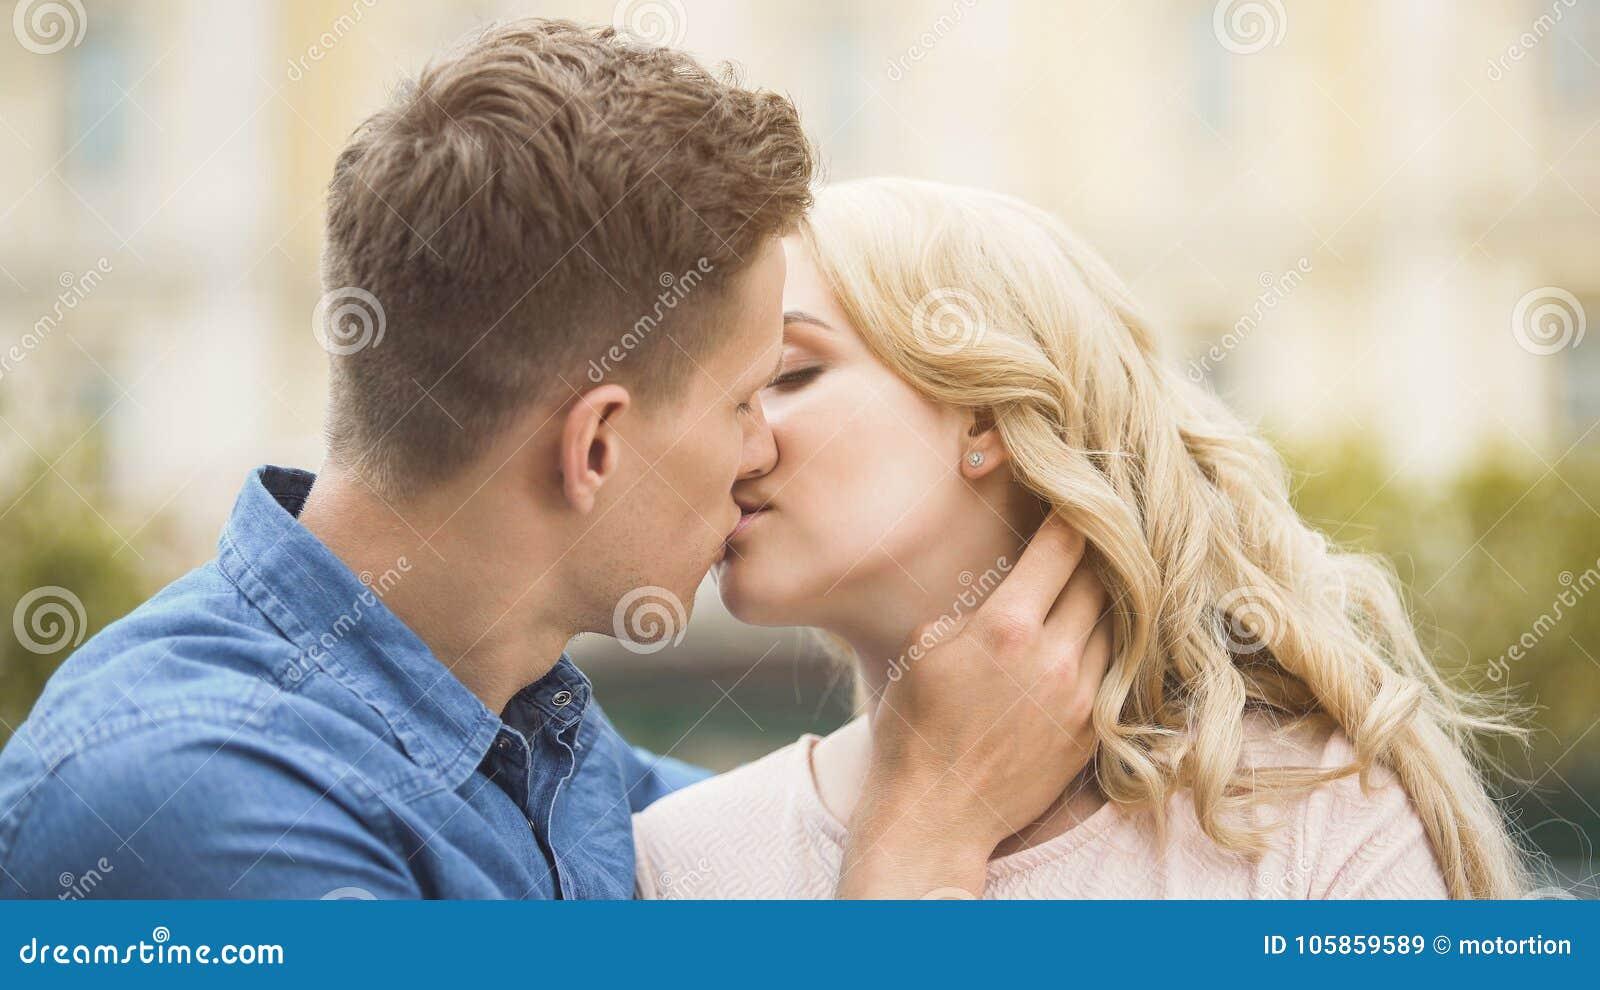 online dating Δυτική Βεγγάλη